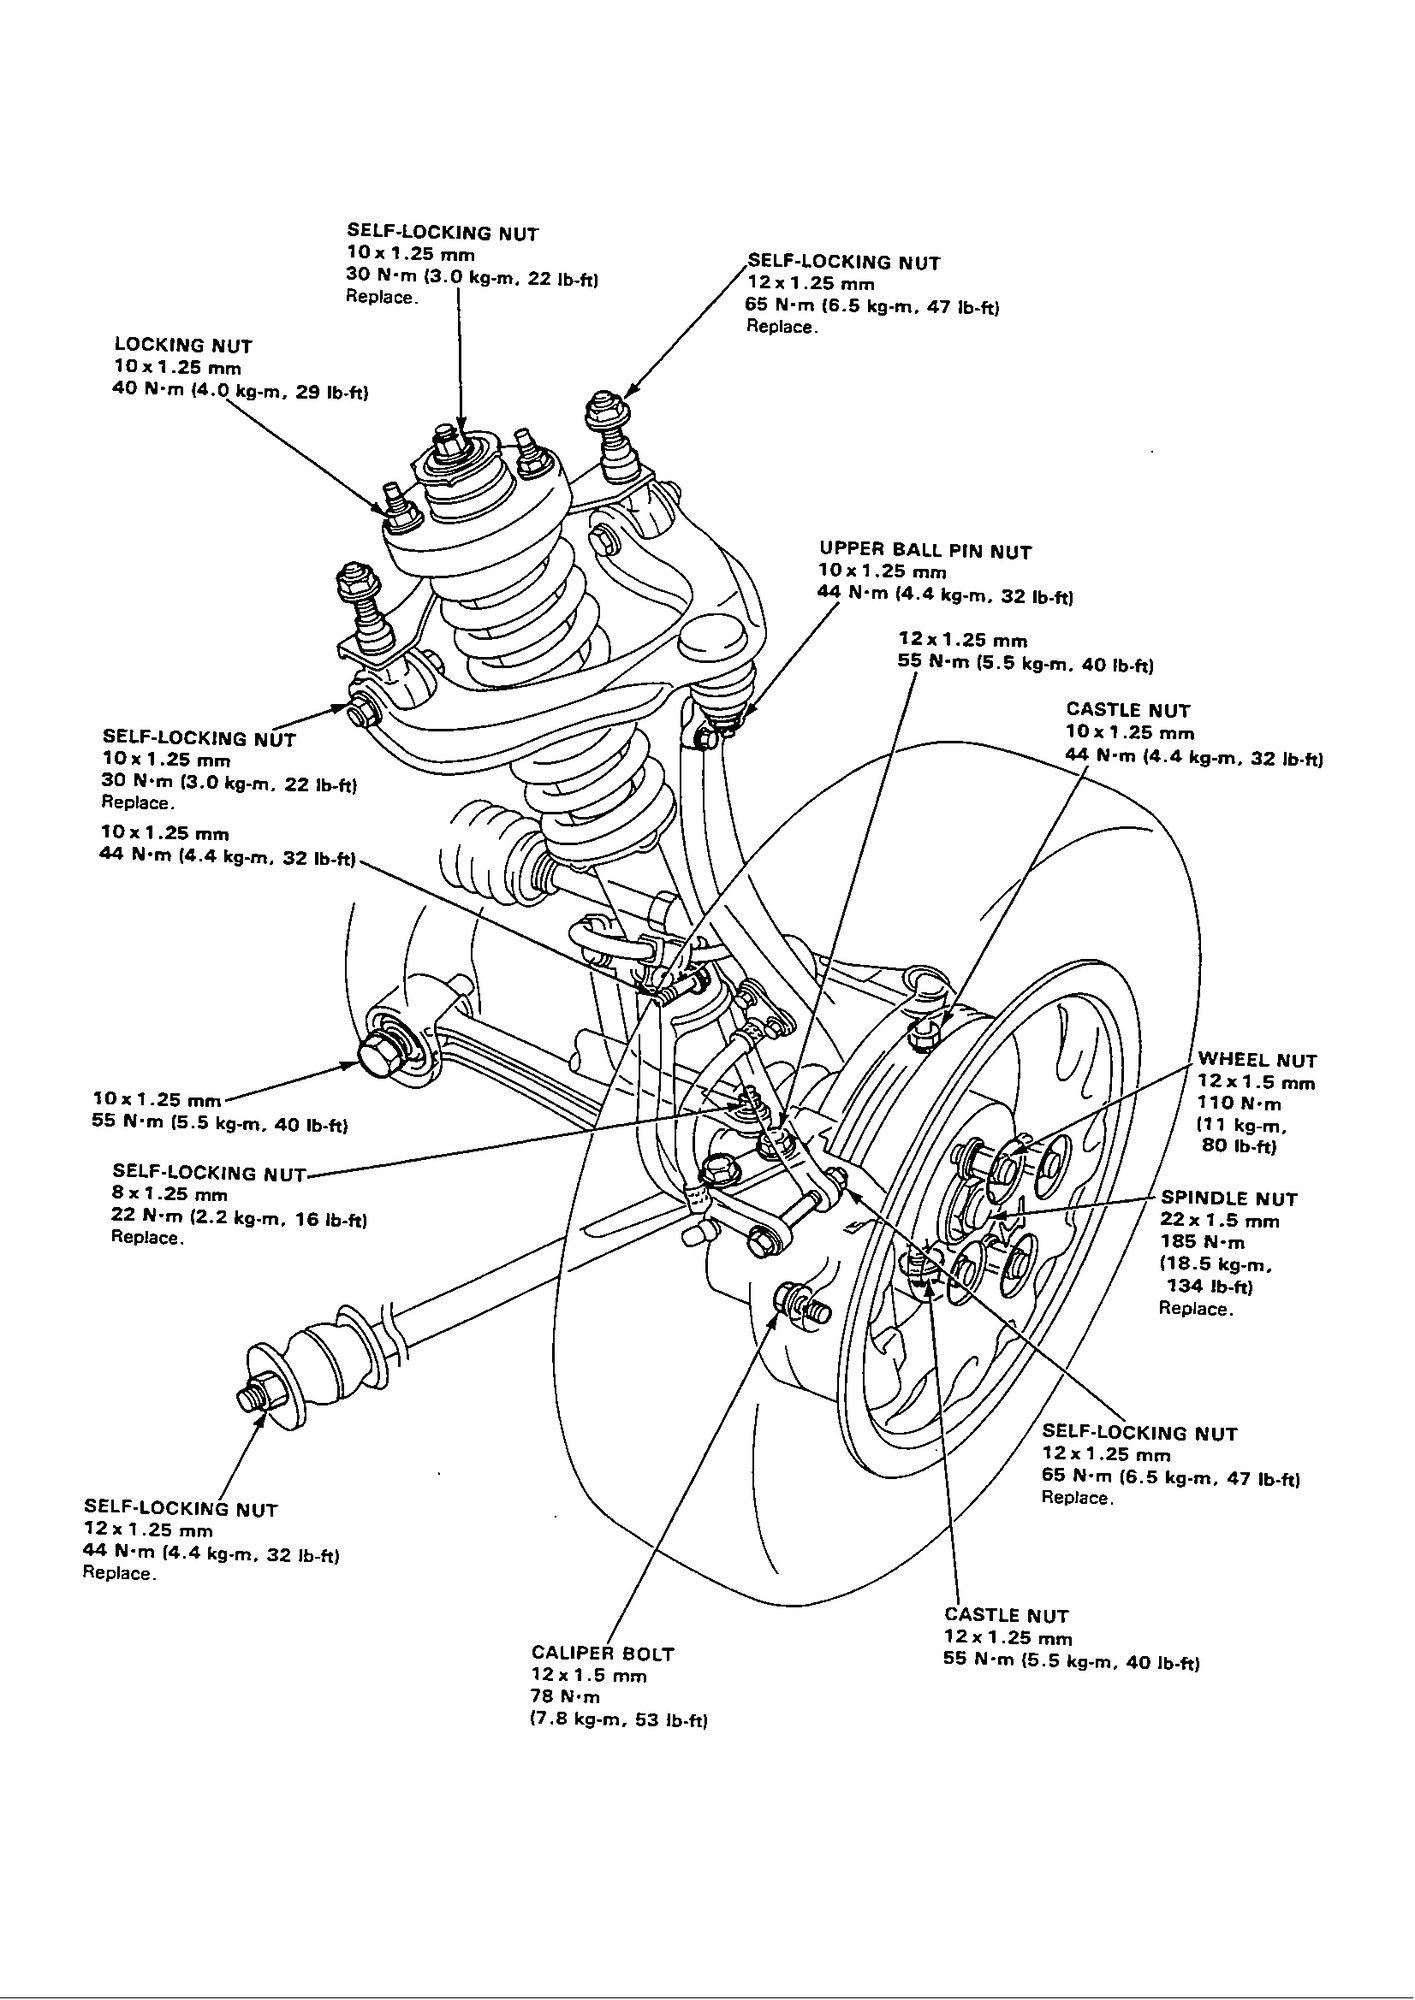 Torque Specs For Radius Rods And Crossmember